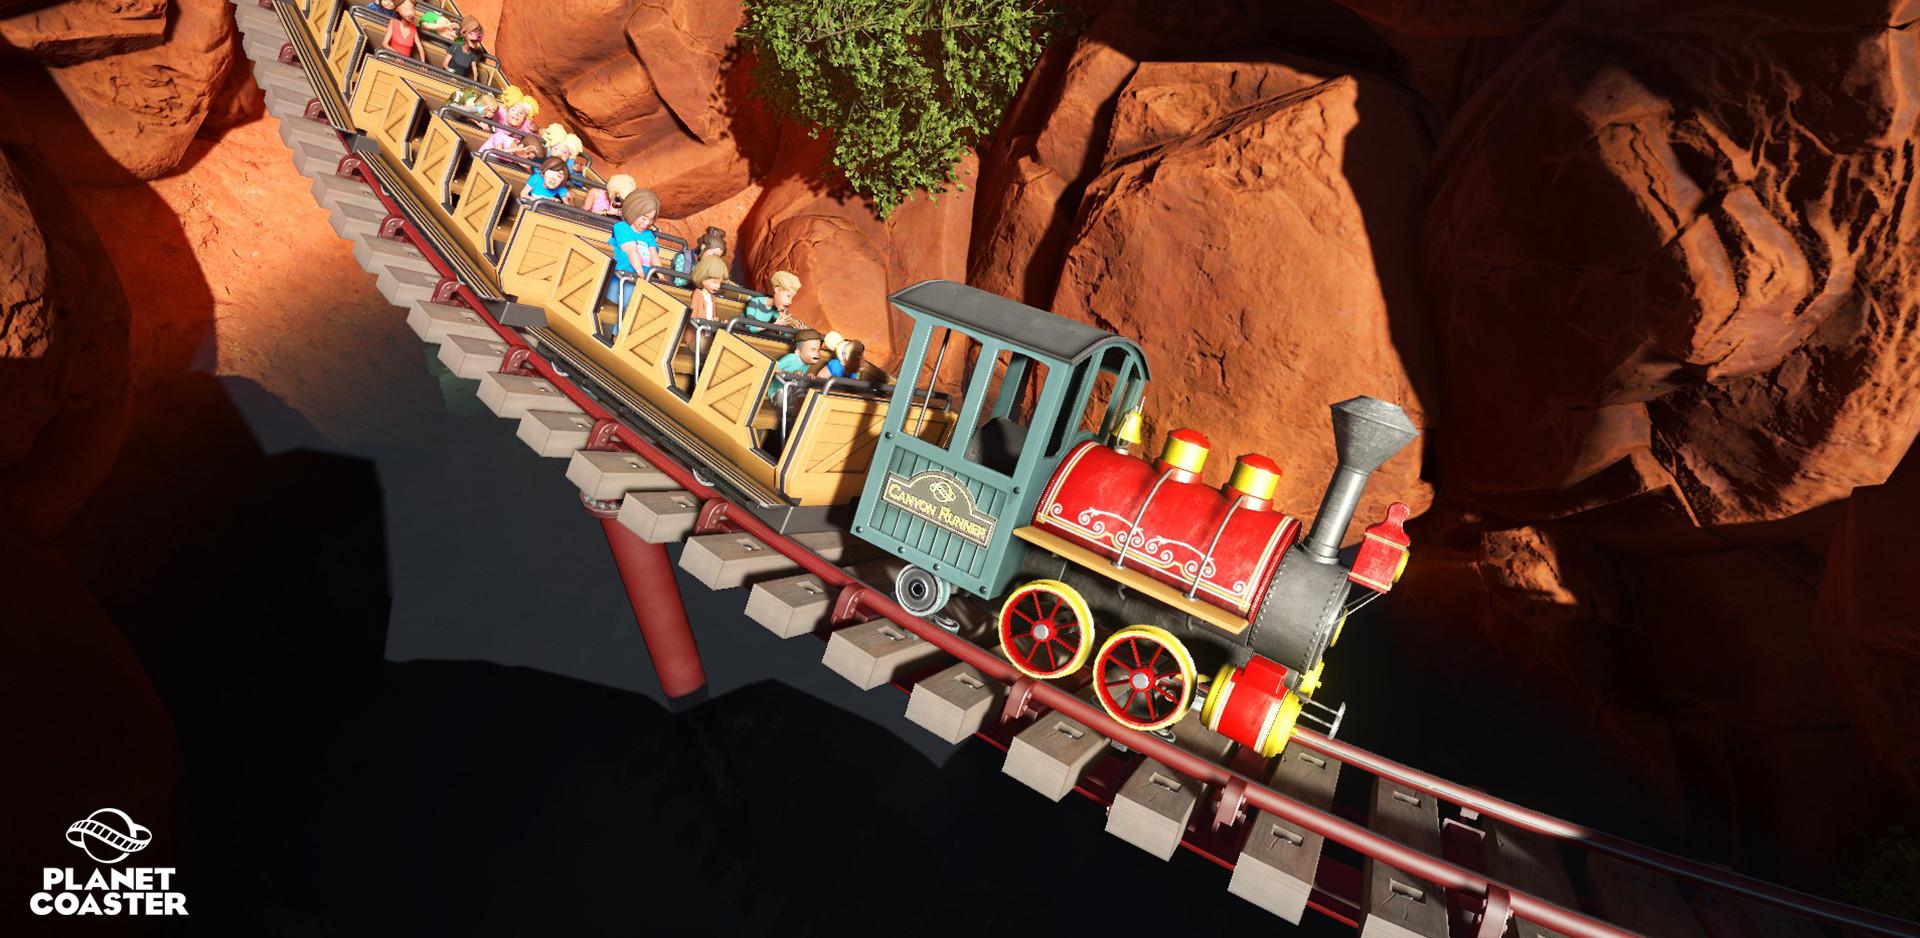 Oscar rickett canyon1